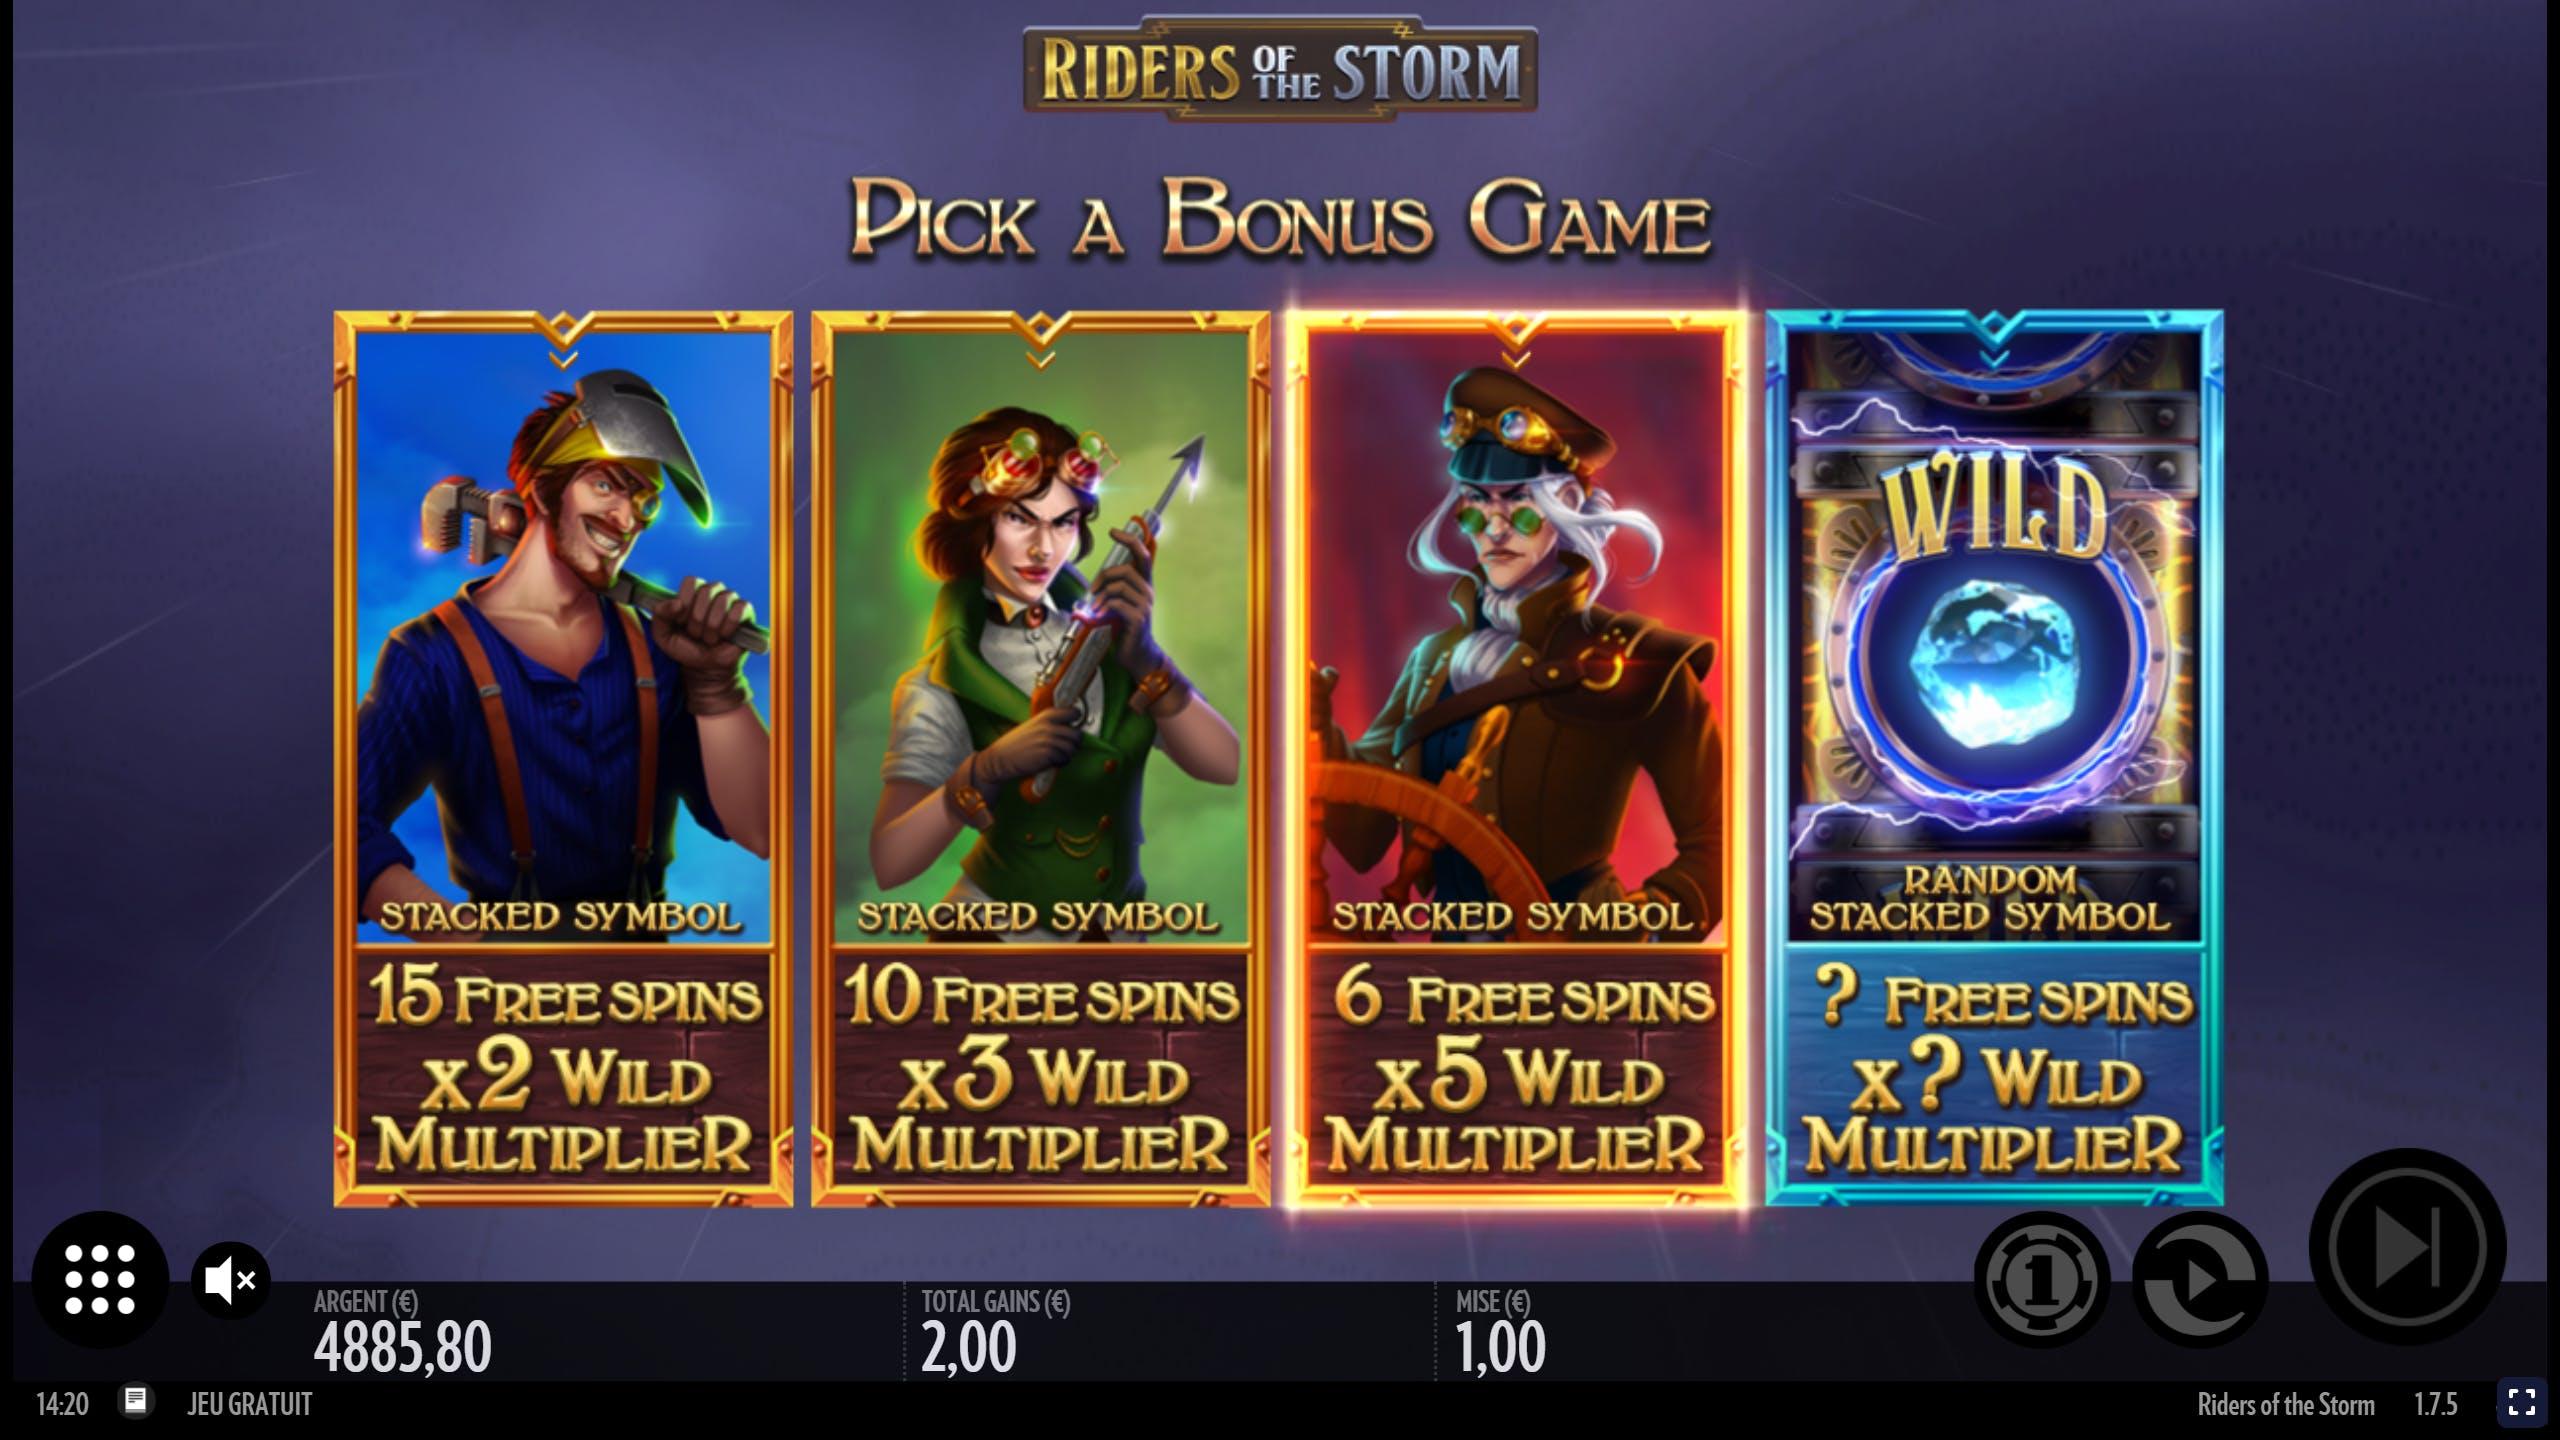 mode de jeu bonus de riders of the storm de thunderkick